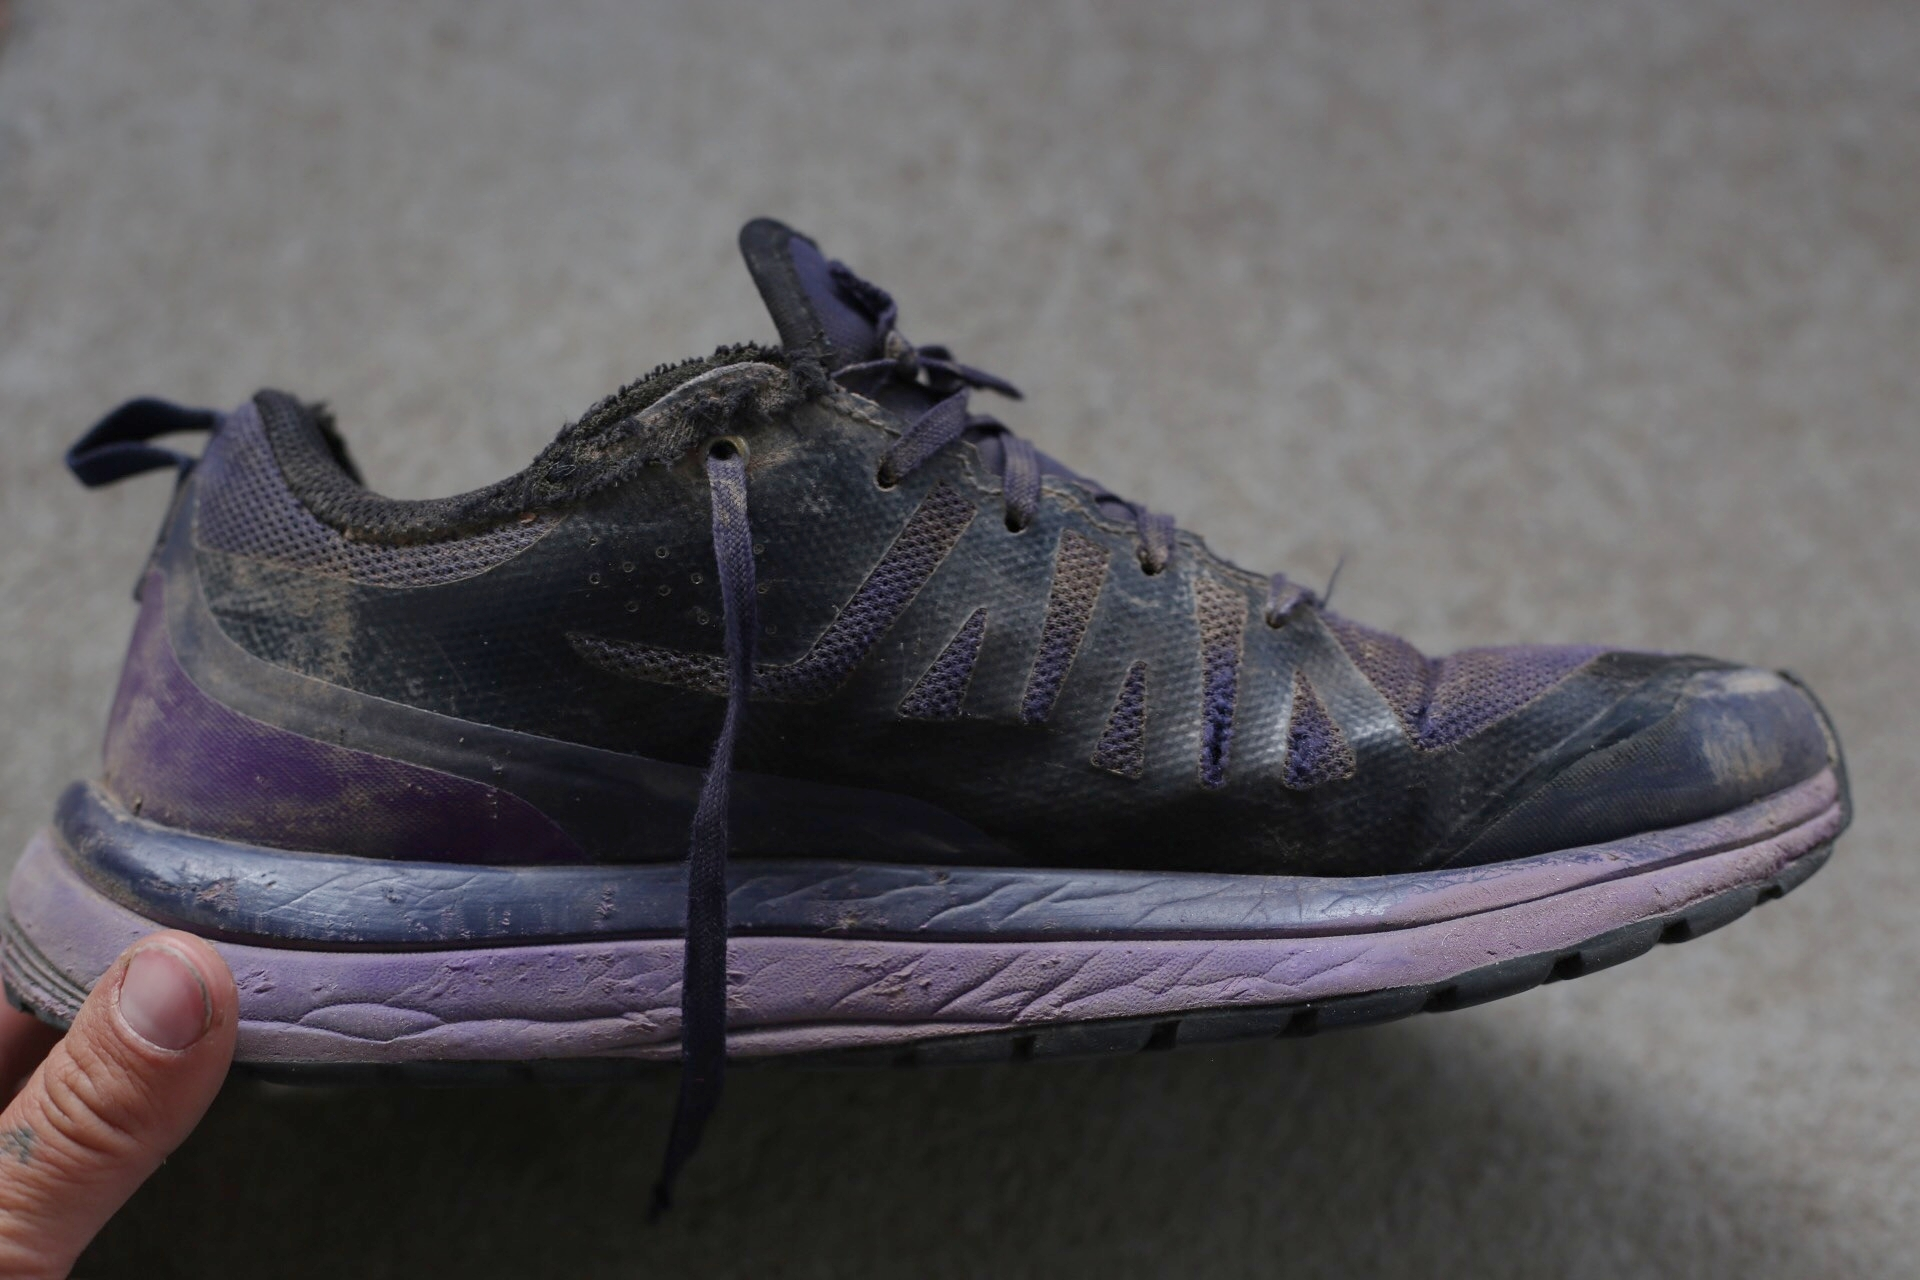 3010ab1628 Review: Salomon Odyssey Pros | Low Profile Hiking Shoe — Trailing .